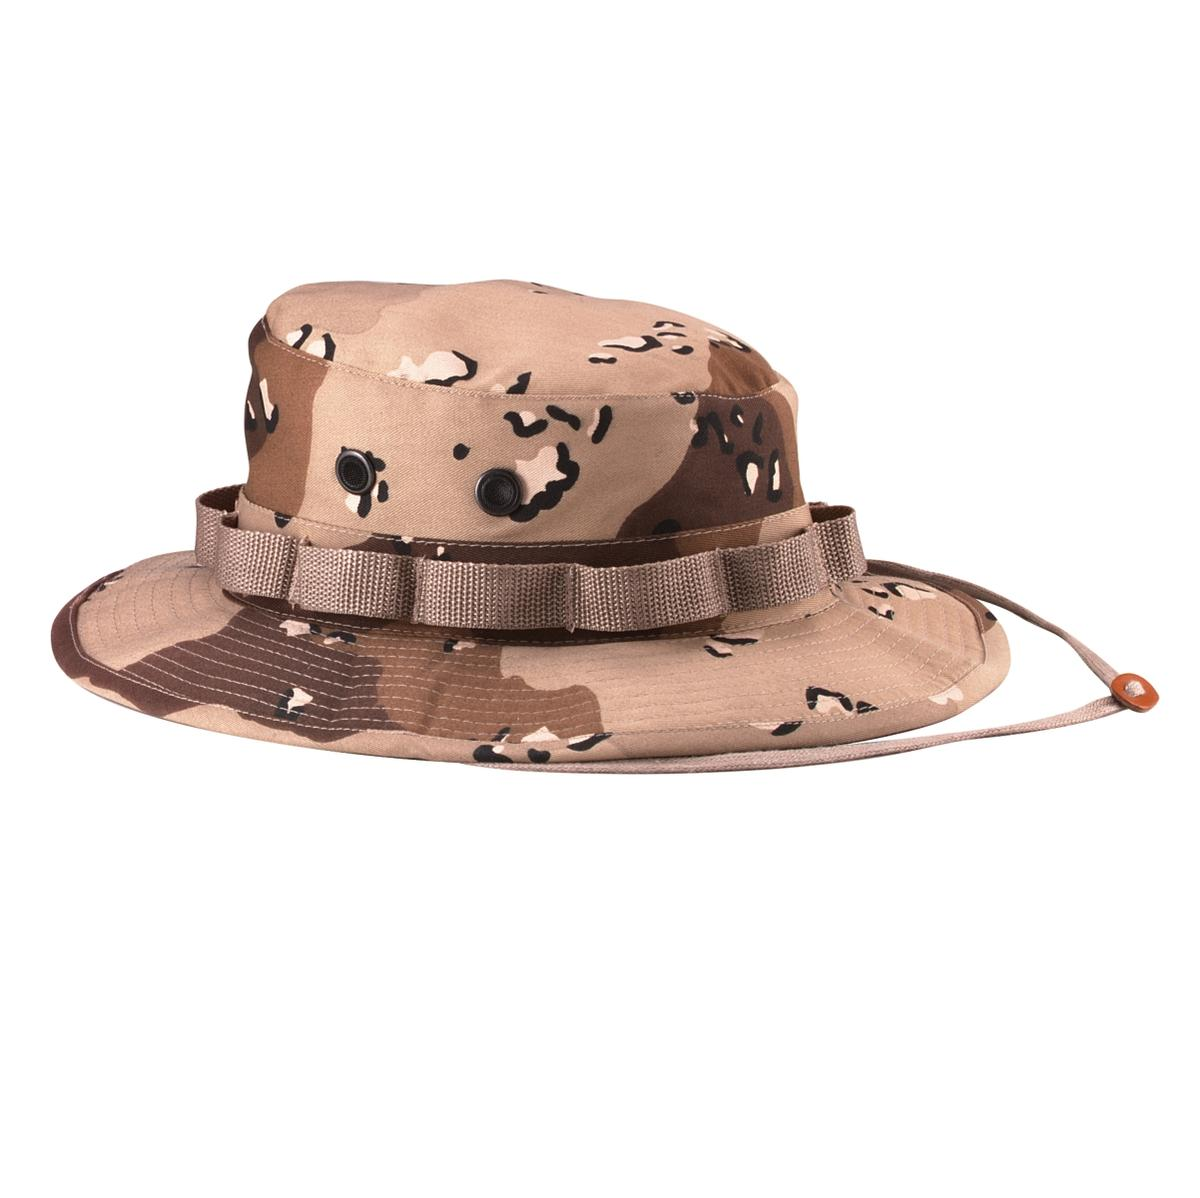 6283028aef73d Desert Camo Ultra Force Boonie Hat